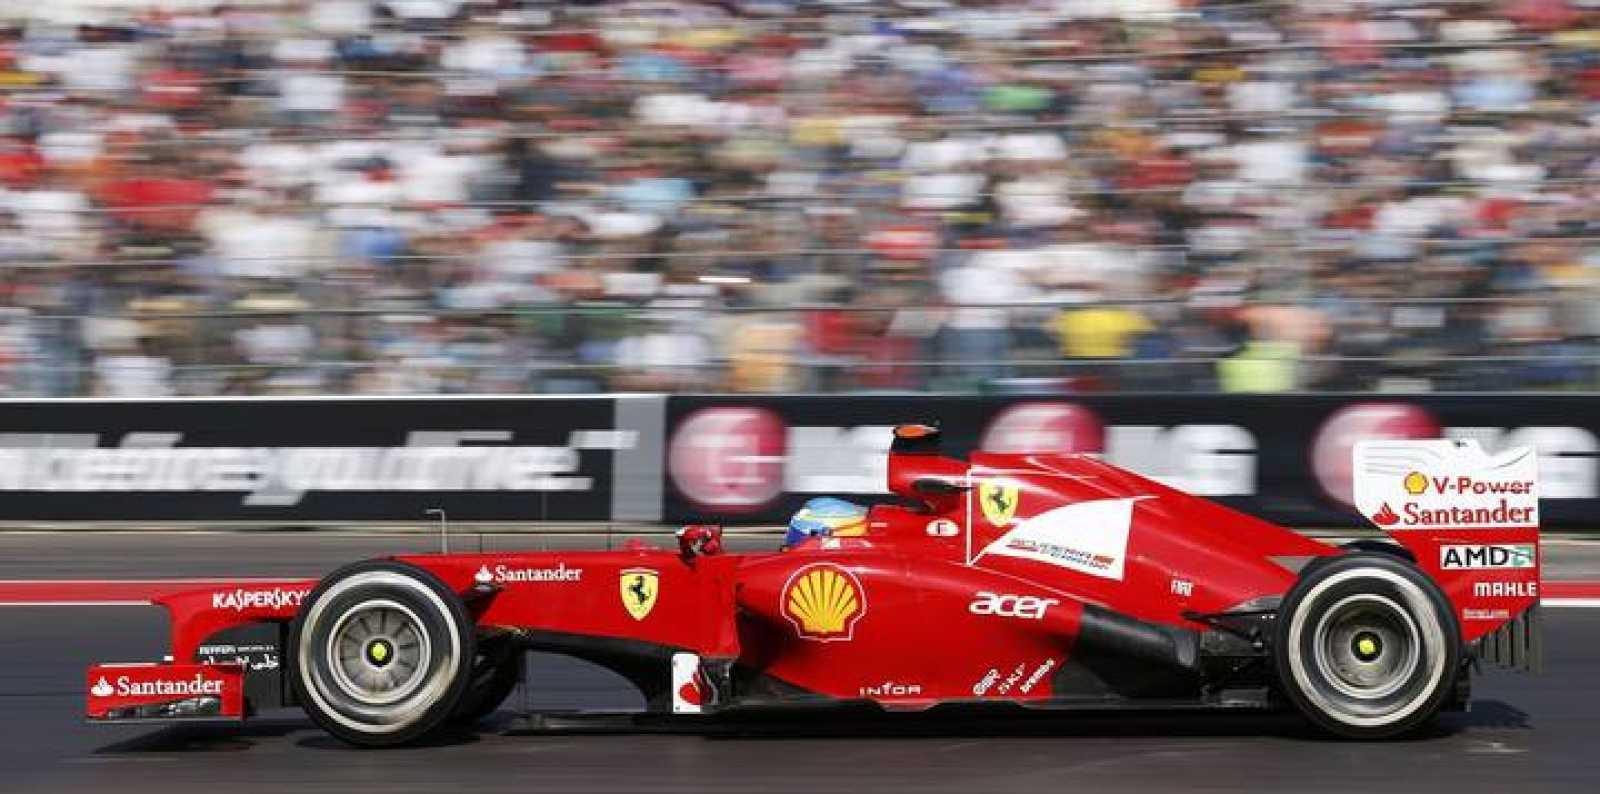 El piloto de Fórmula 1 Fernando Alonso rueda sobre el circuito de Austin.